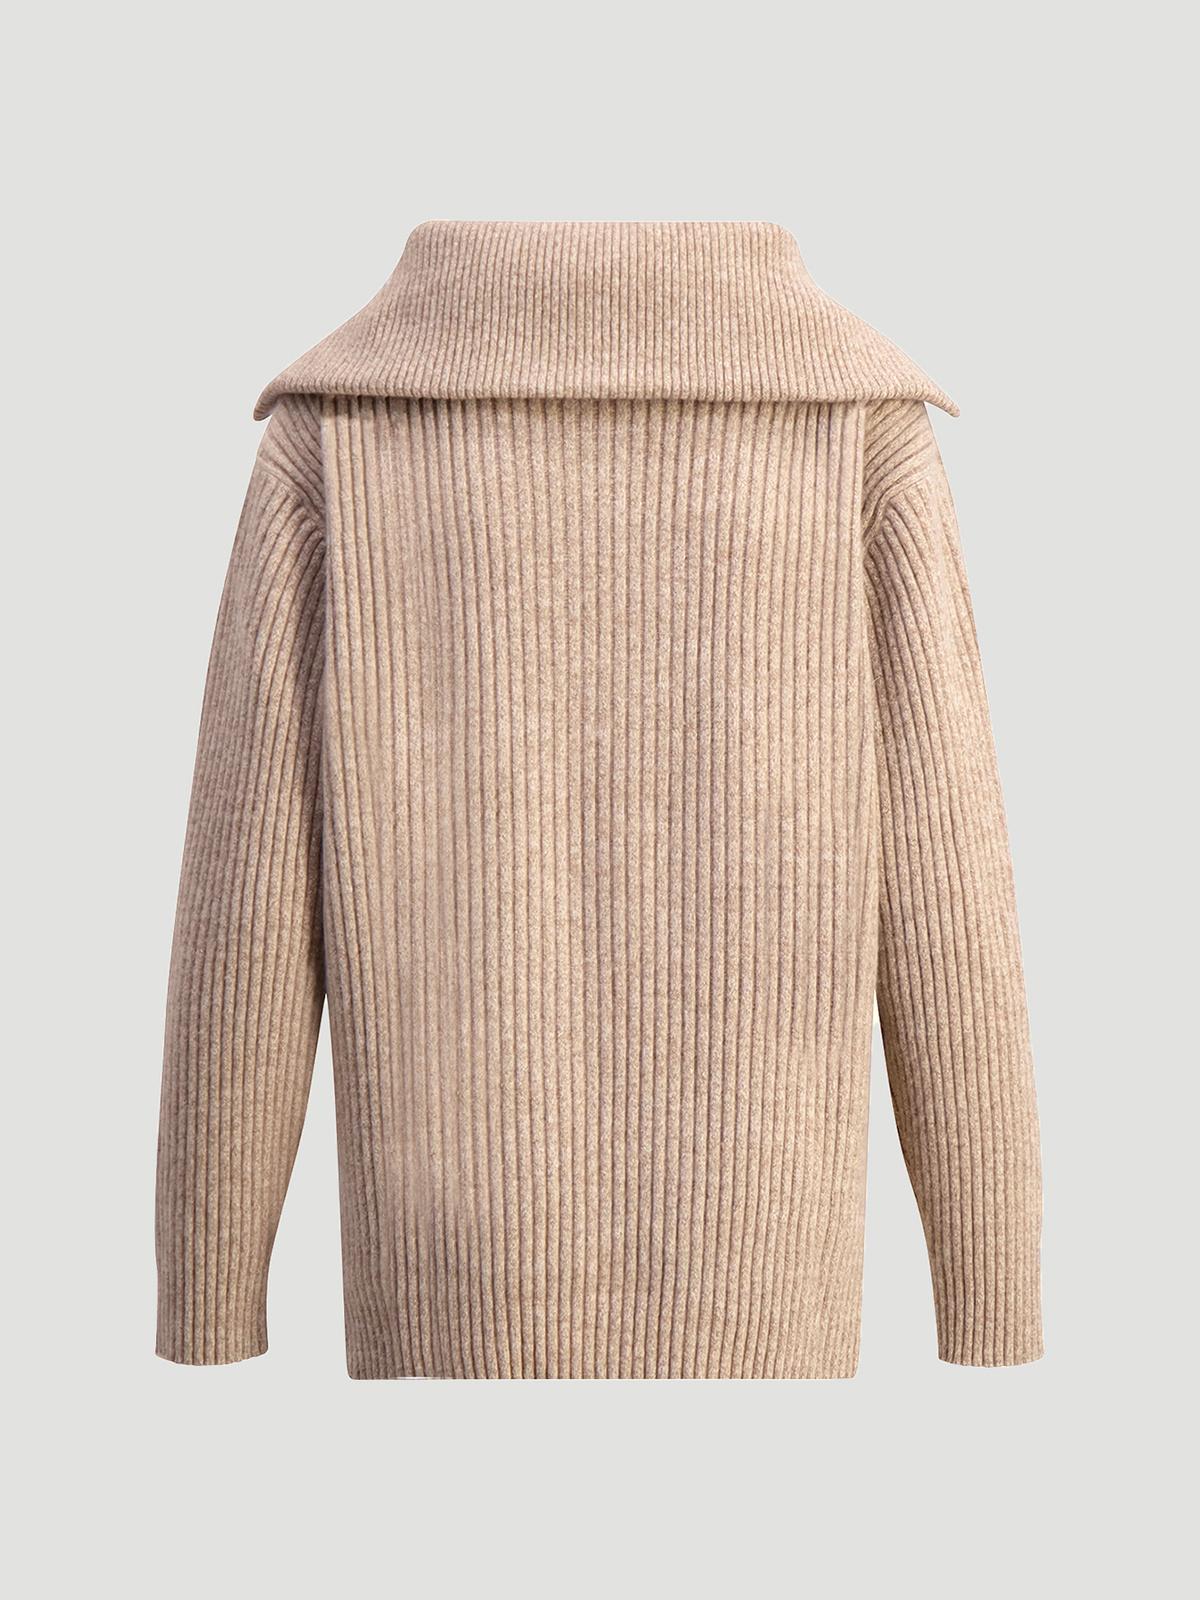 React Knit Sweater  Sand 6